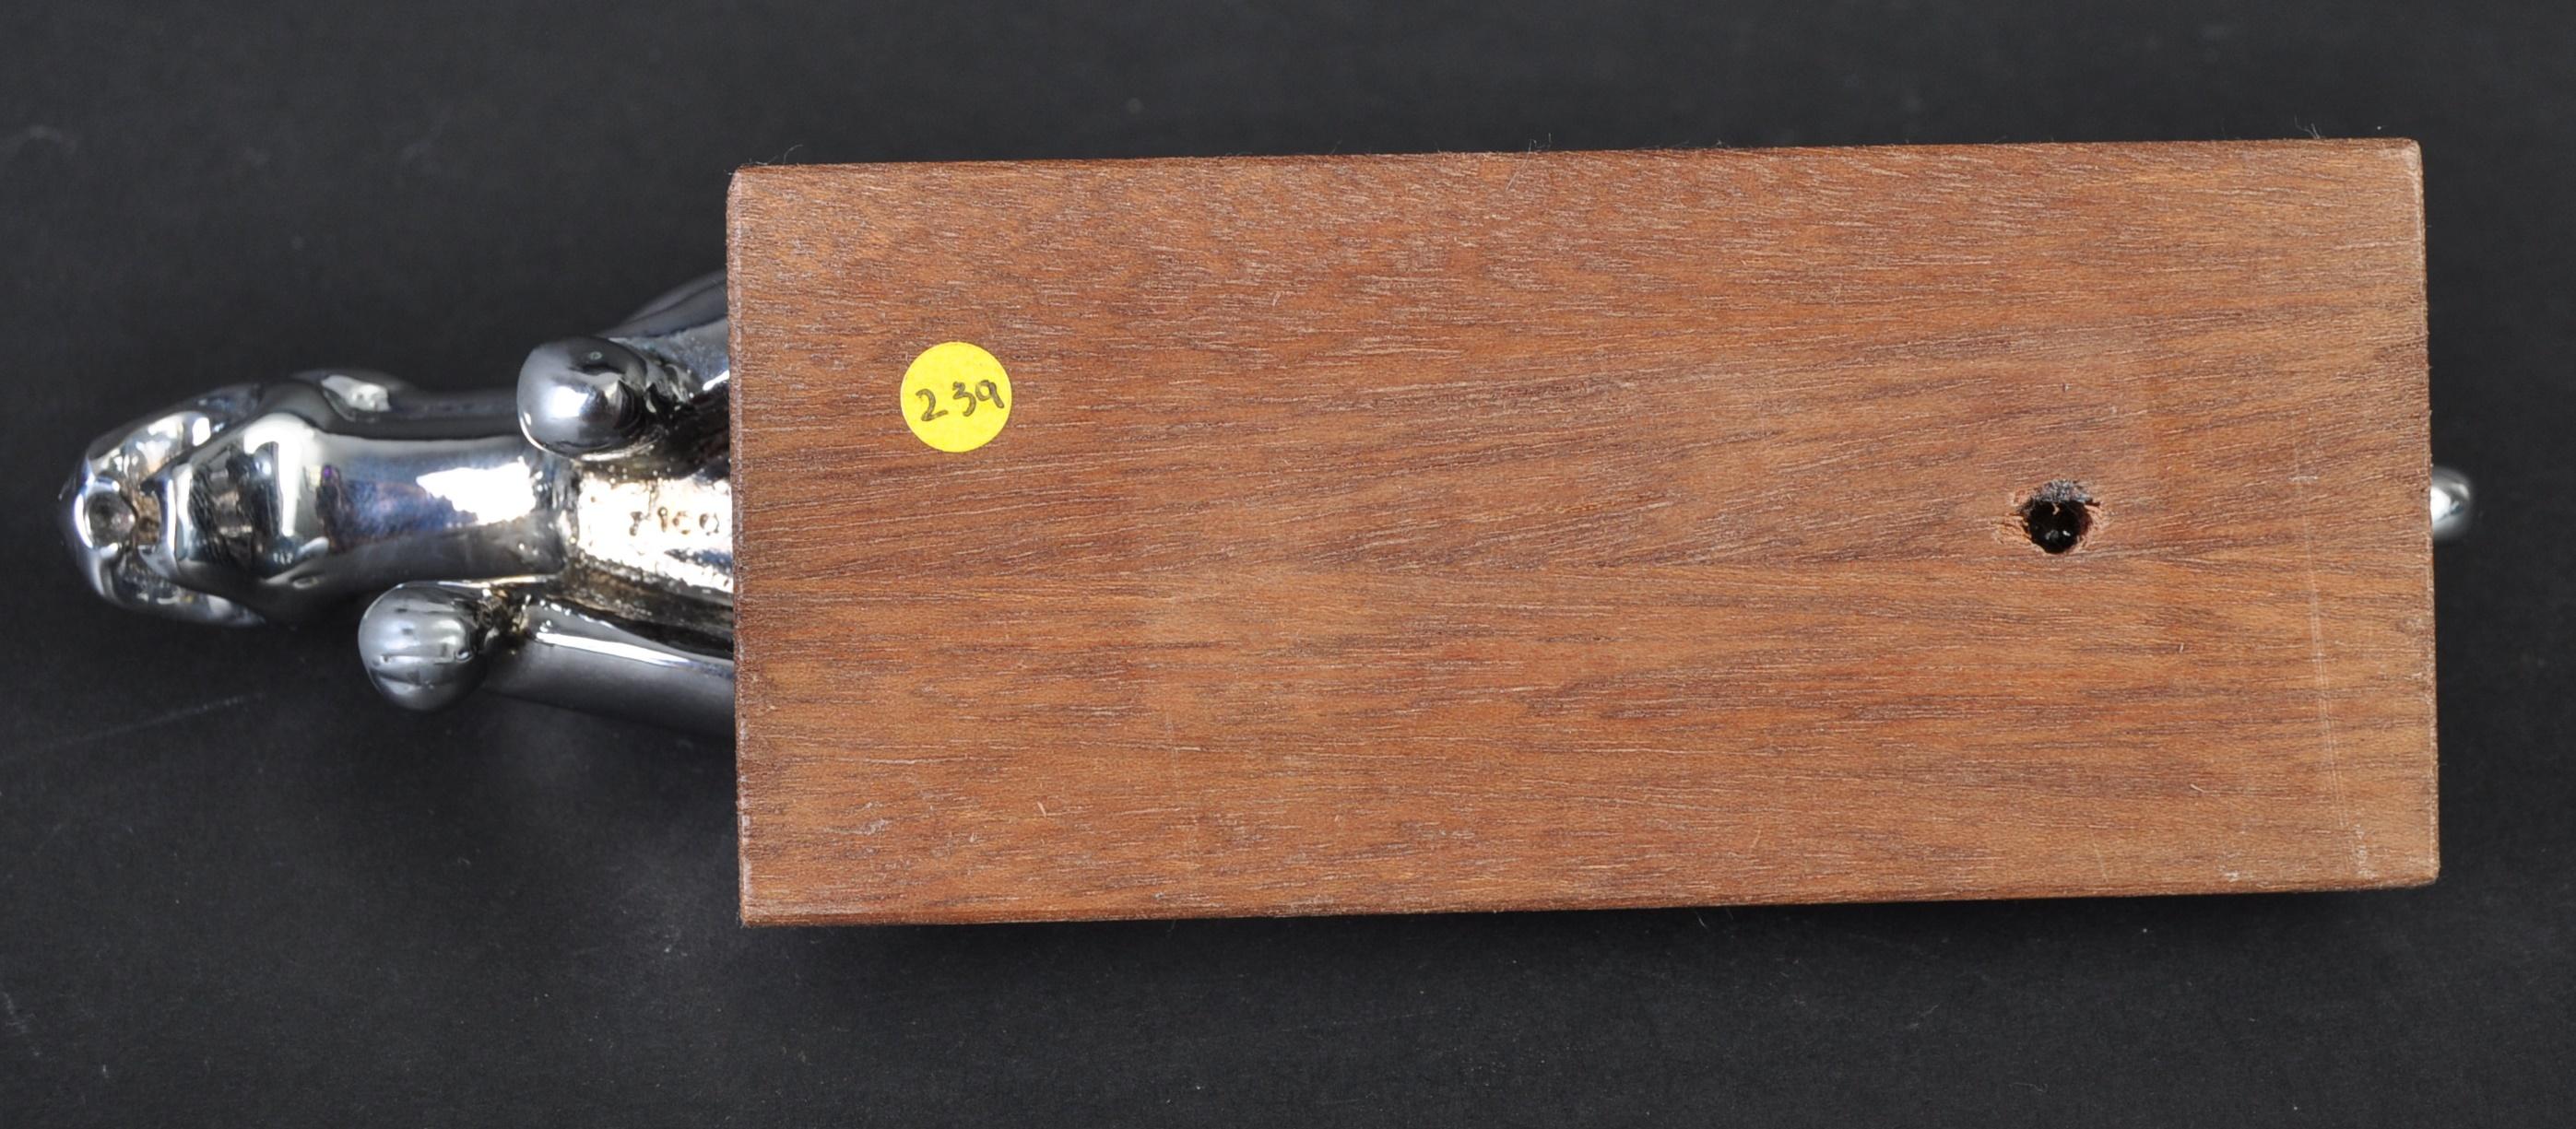 JAGUAR MASCOT - EARLY TYPE 2 MASCOT ON PLINTH BASE - Image 5 of 5